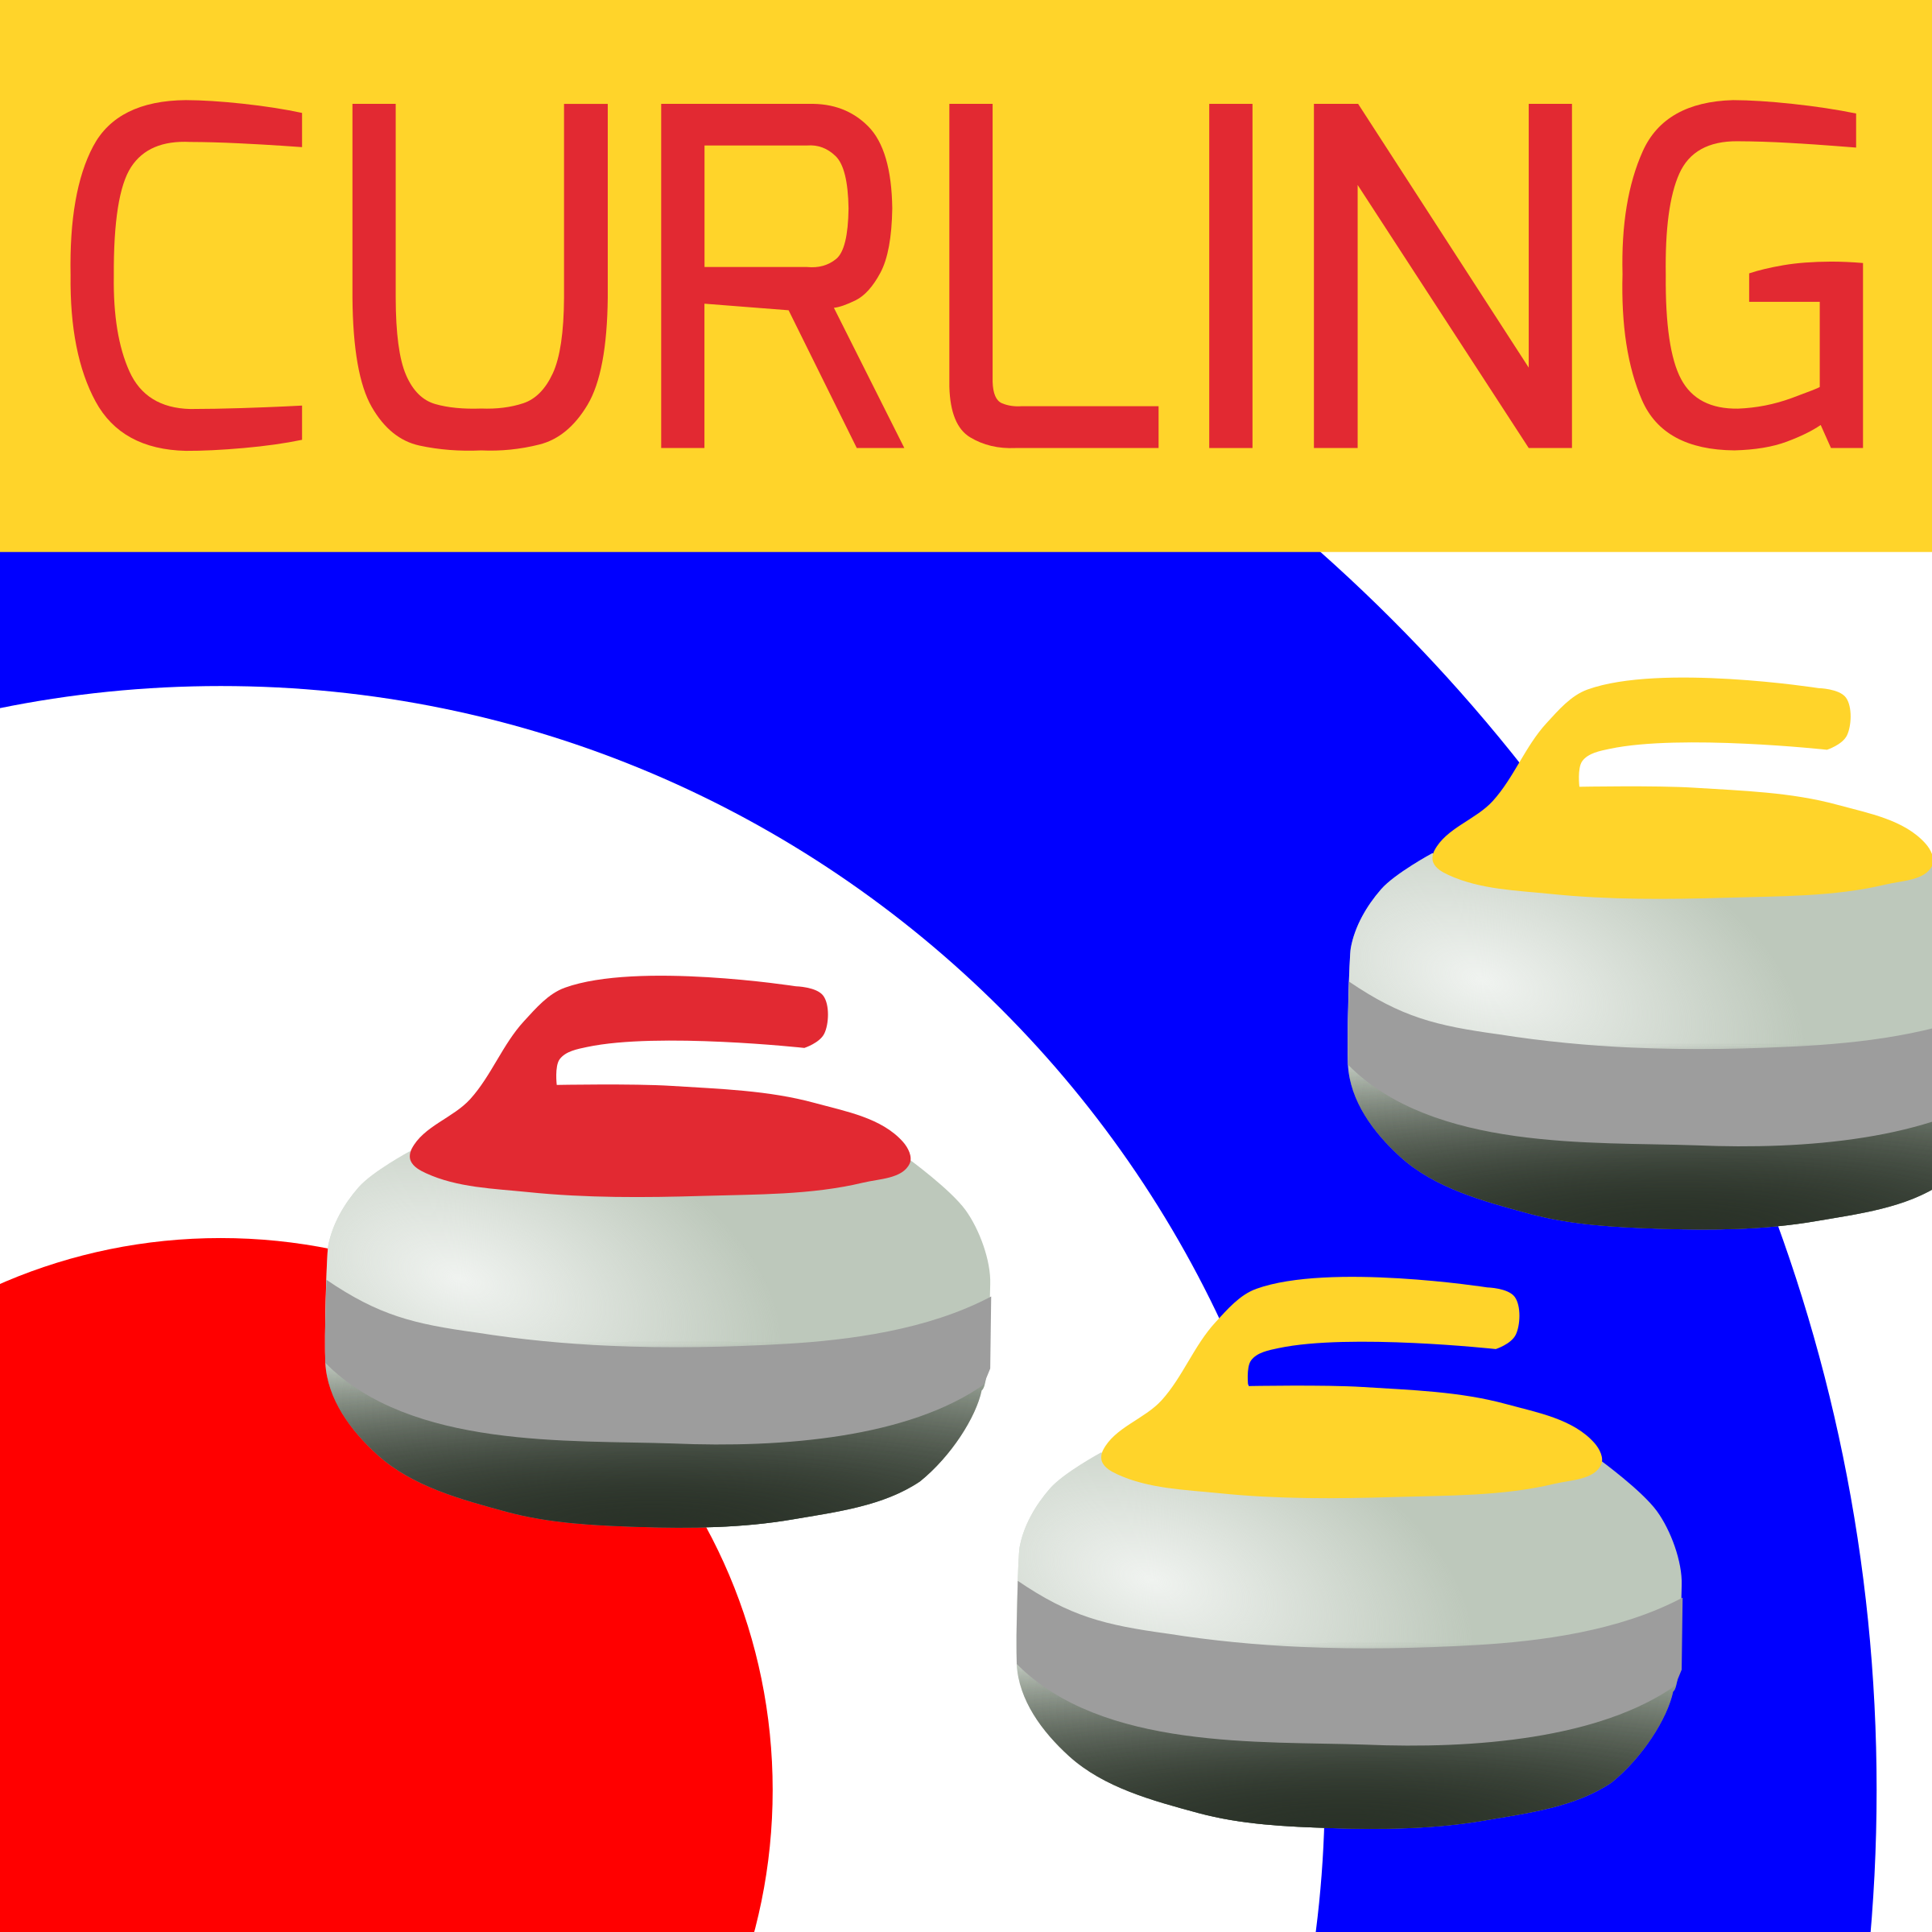 Curling pictures clip art.